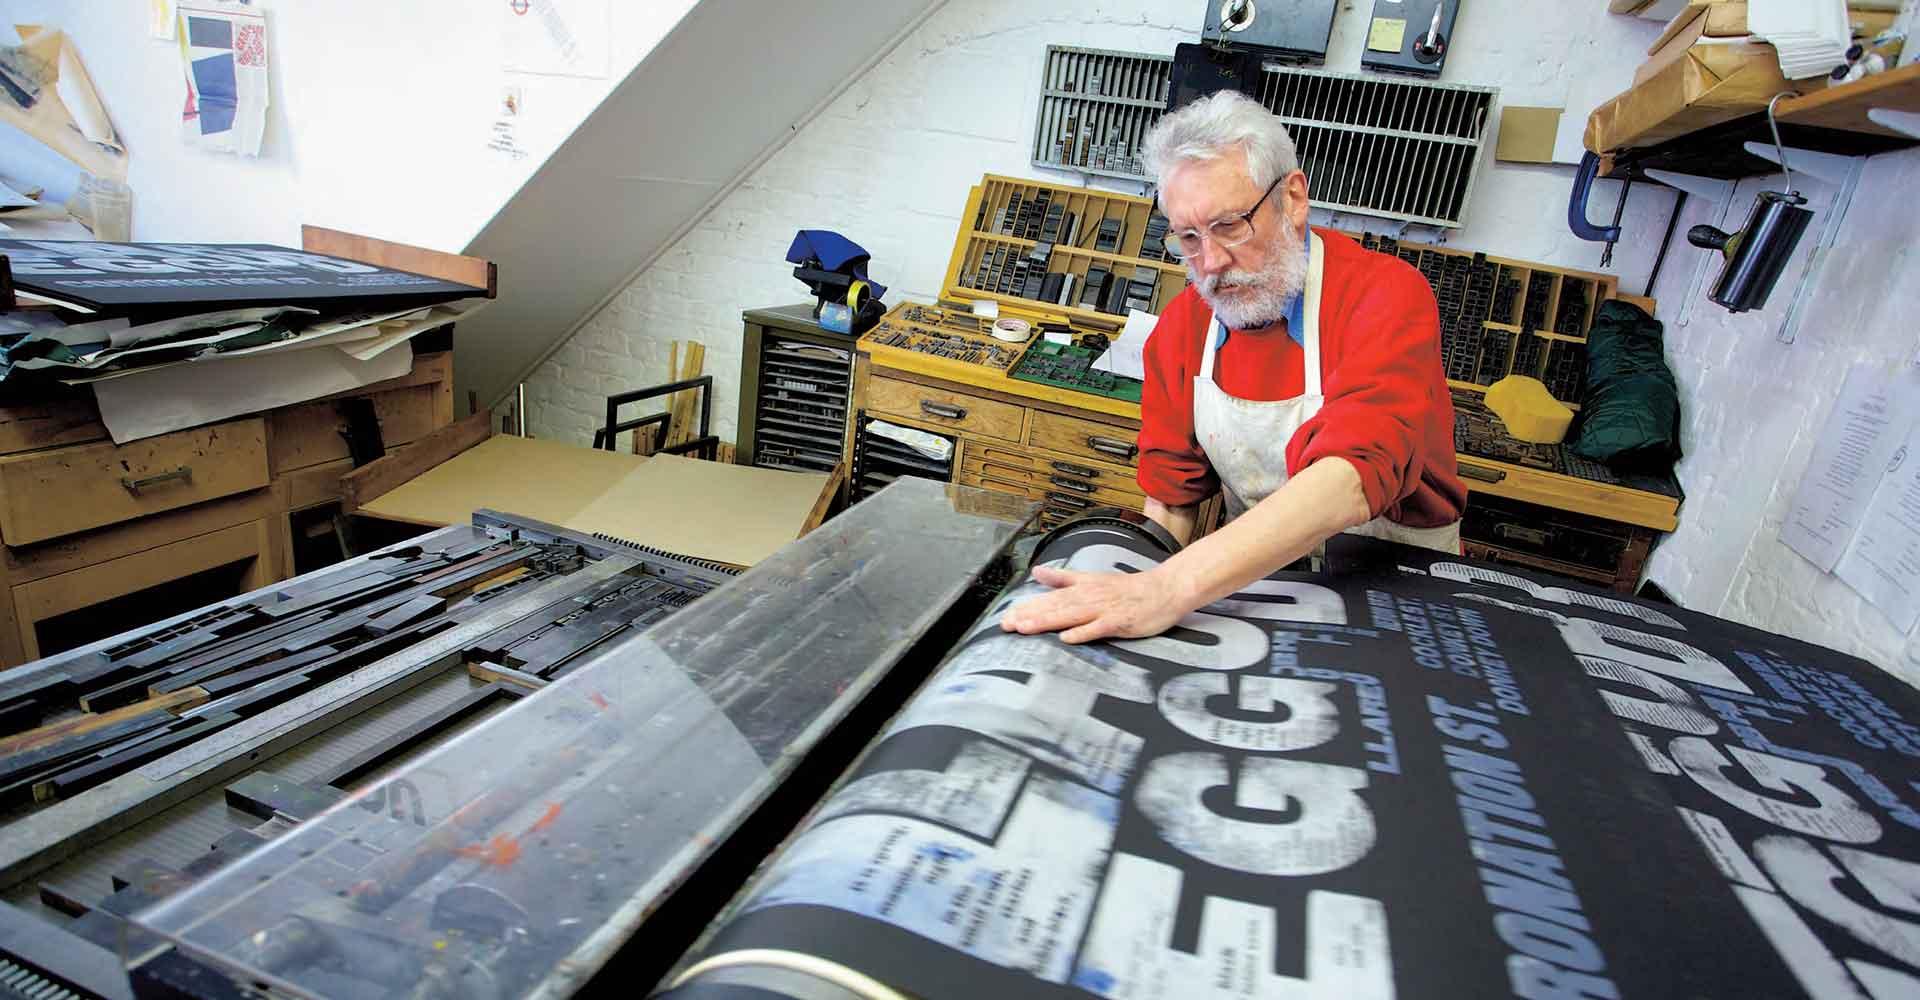 Alan_Kitiching_letterpress_edit